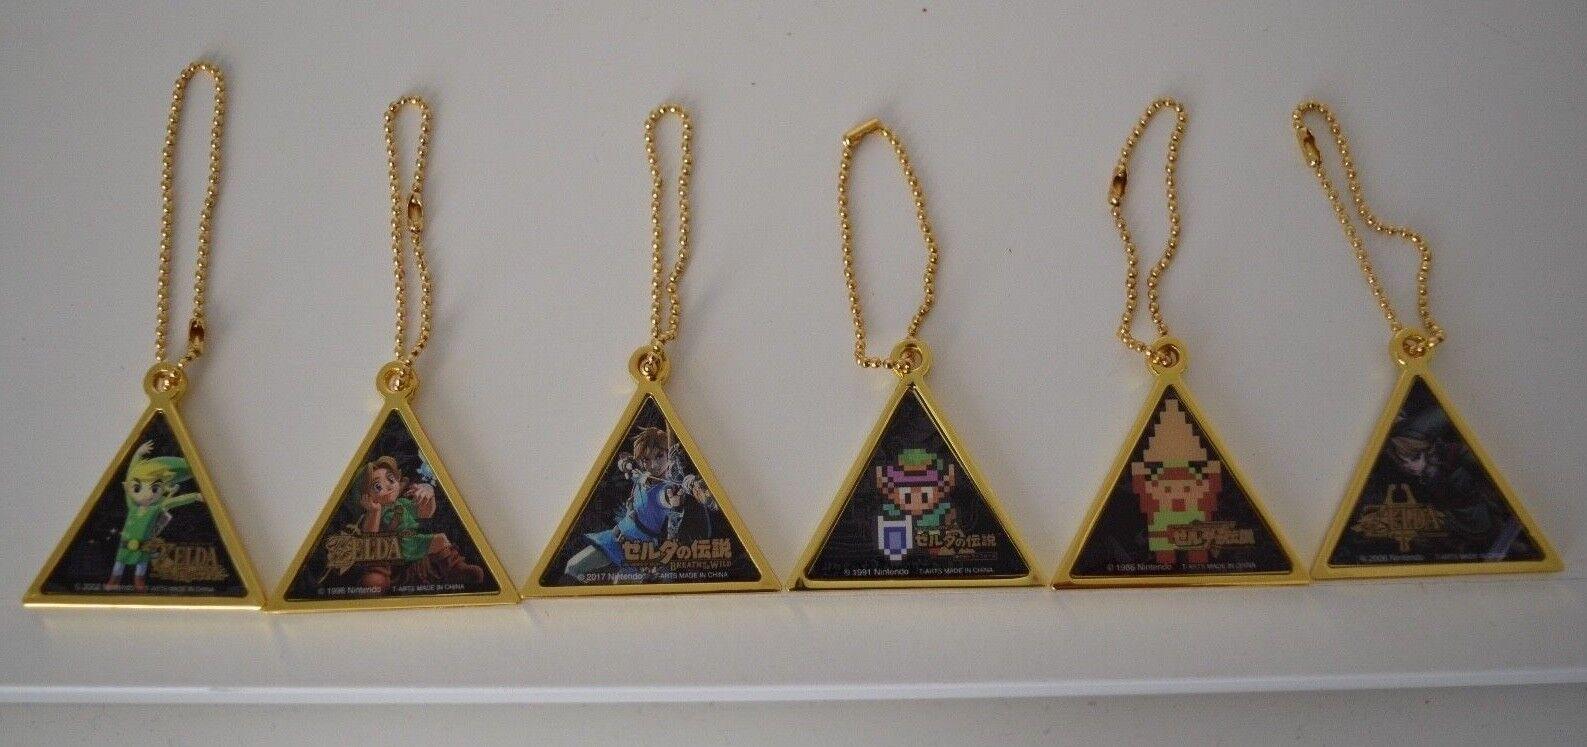 TOMY The Legend of Zelda Triforce COMPLETE Zelda Pendant Dangler Collection